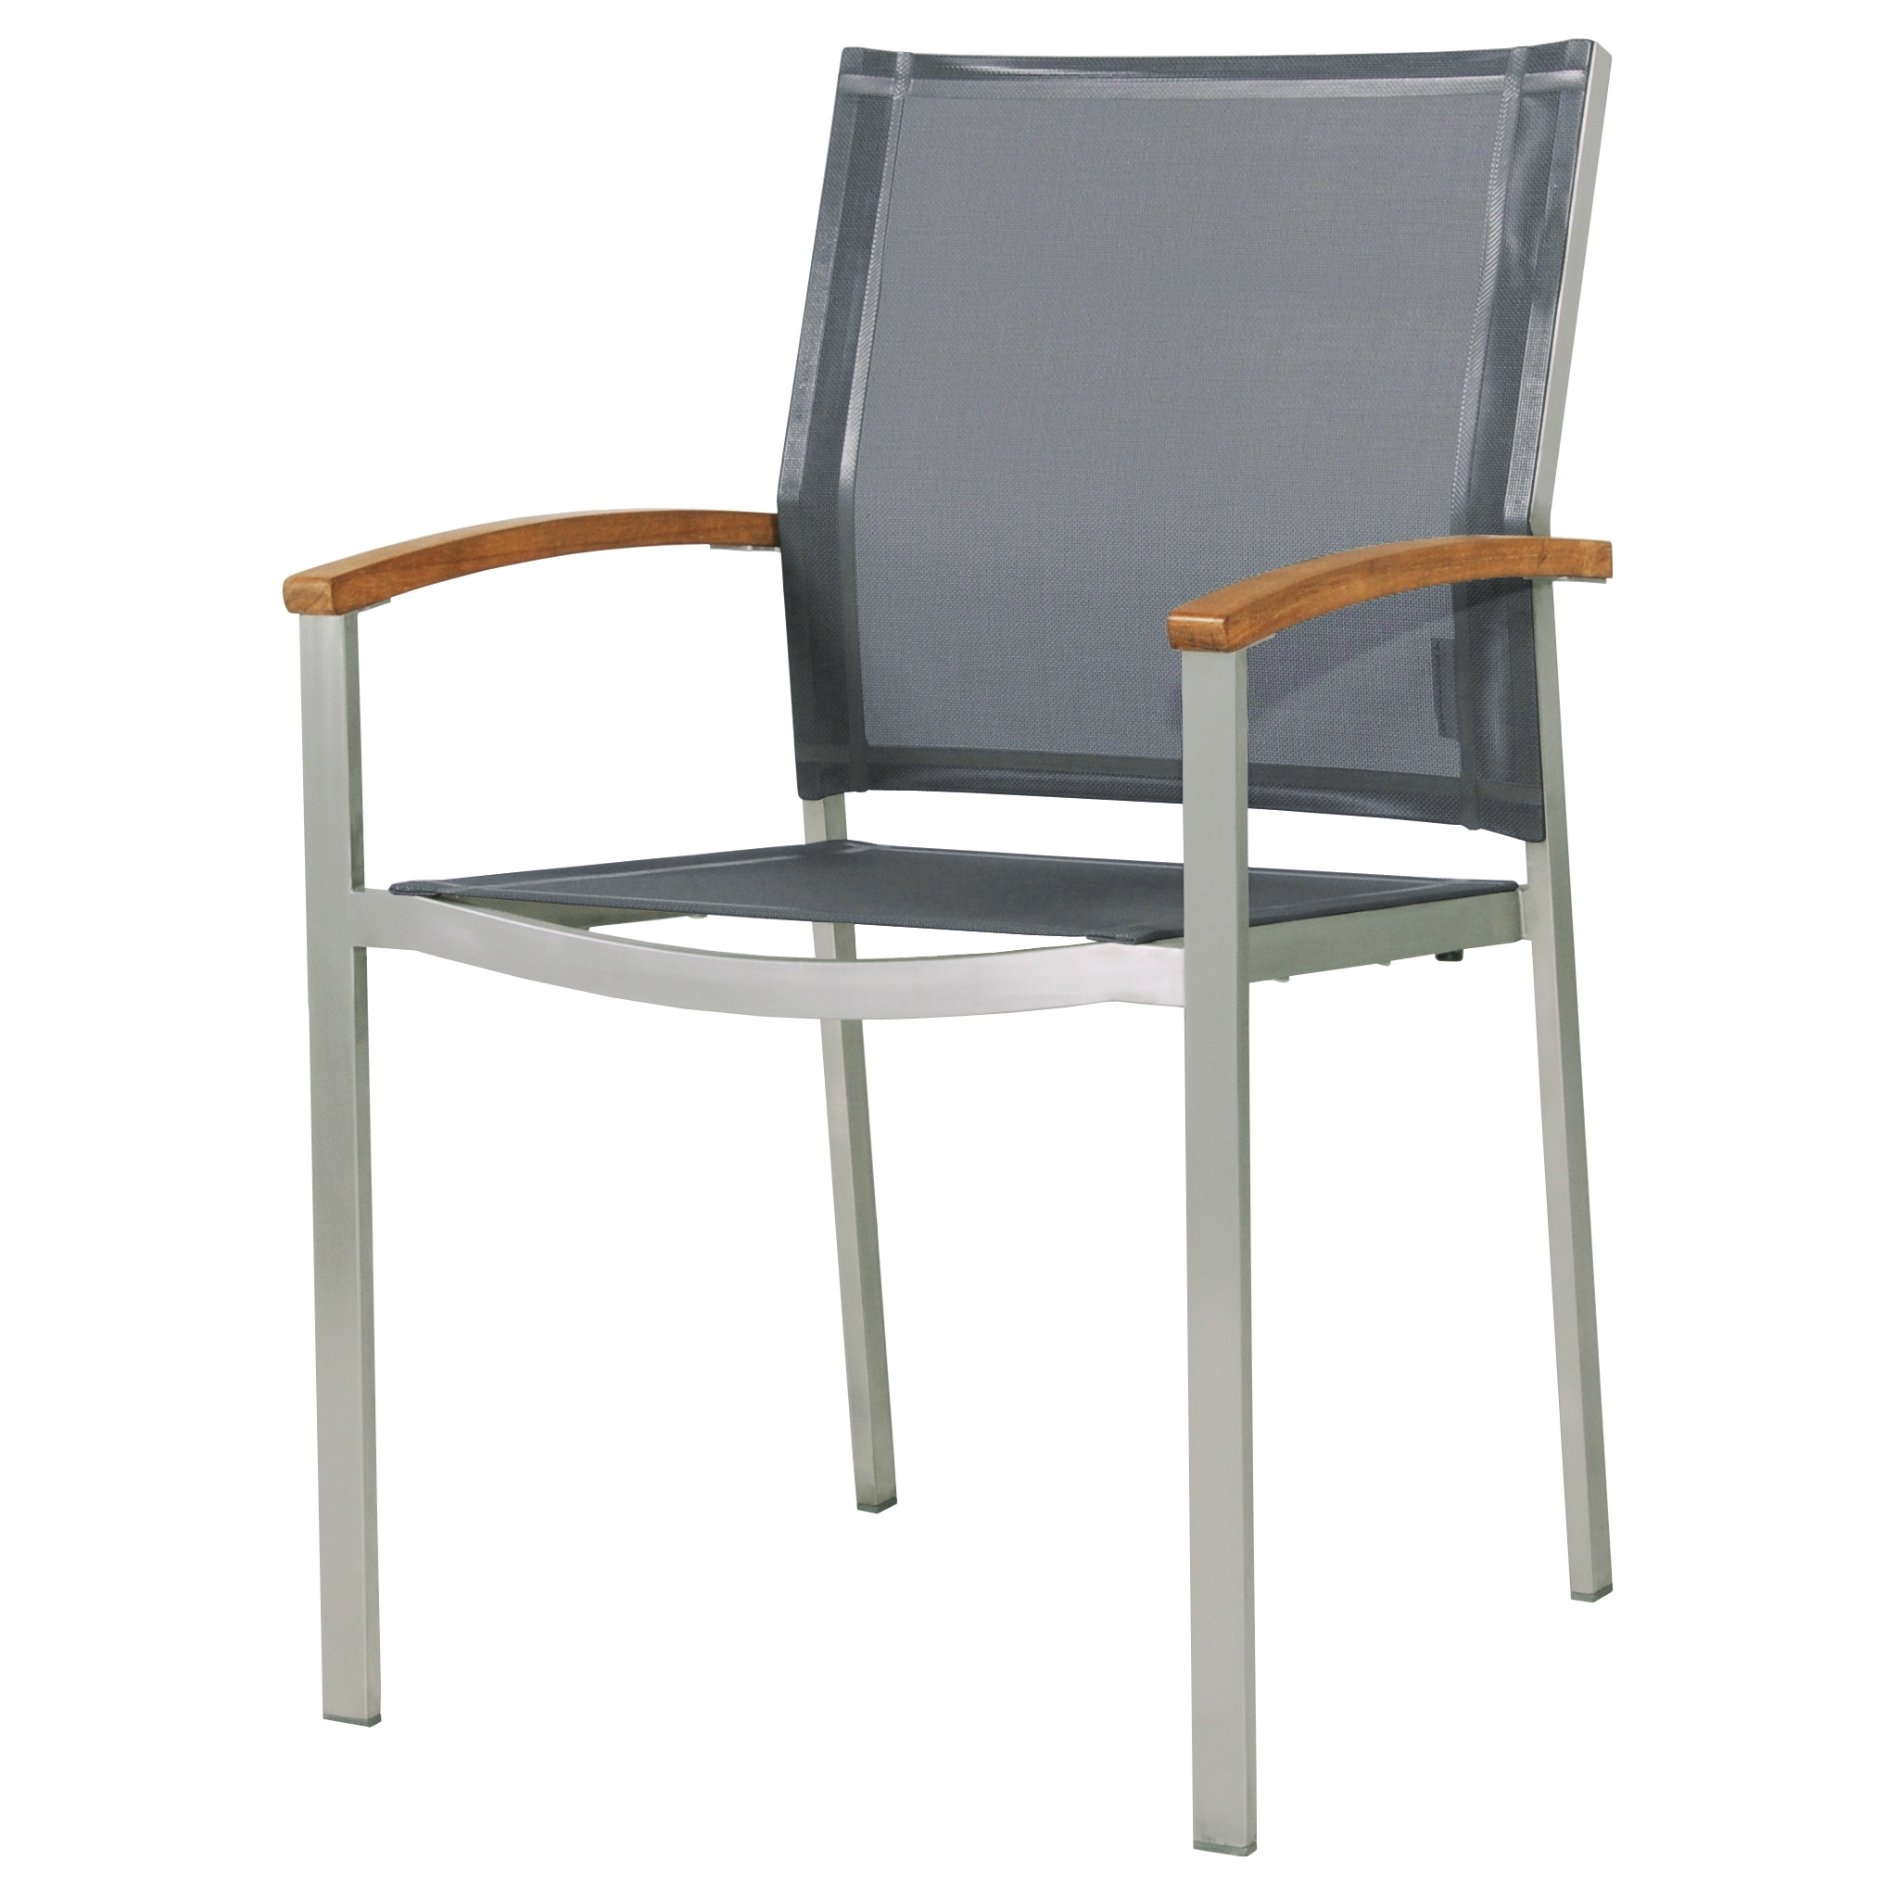 zebra setax stapelsesselr ckenlehne hoch. Black Bedroom Furniture Sets. Home Design Ideas